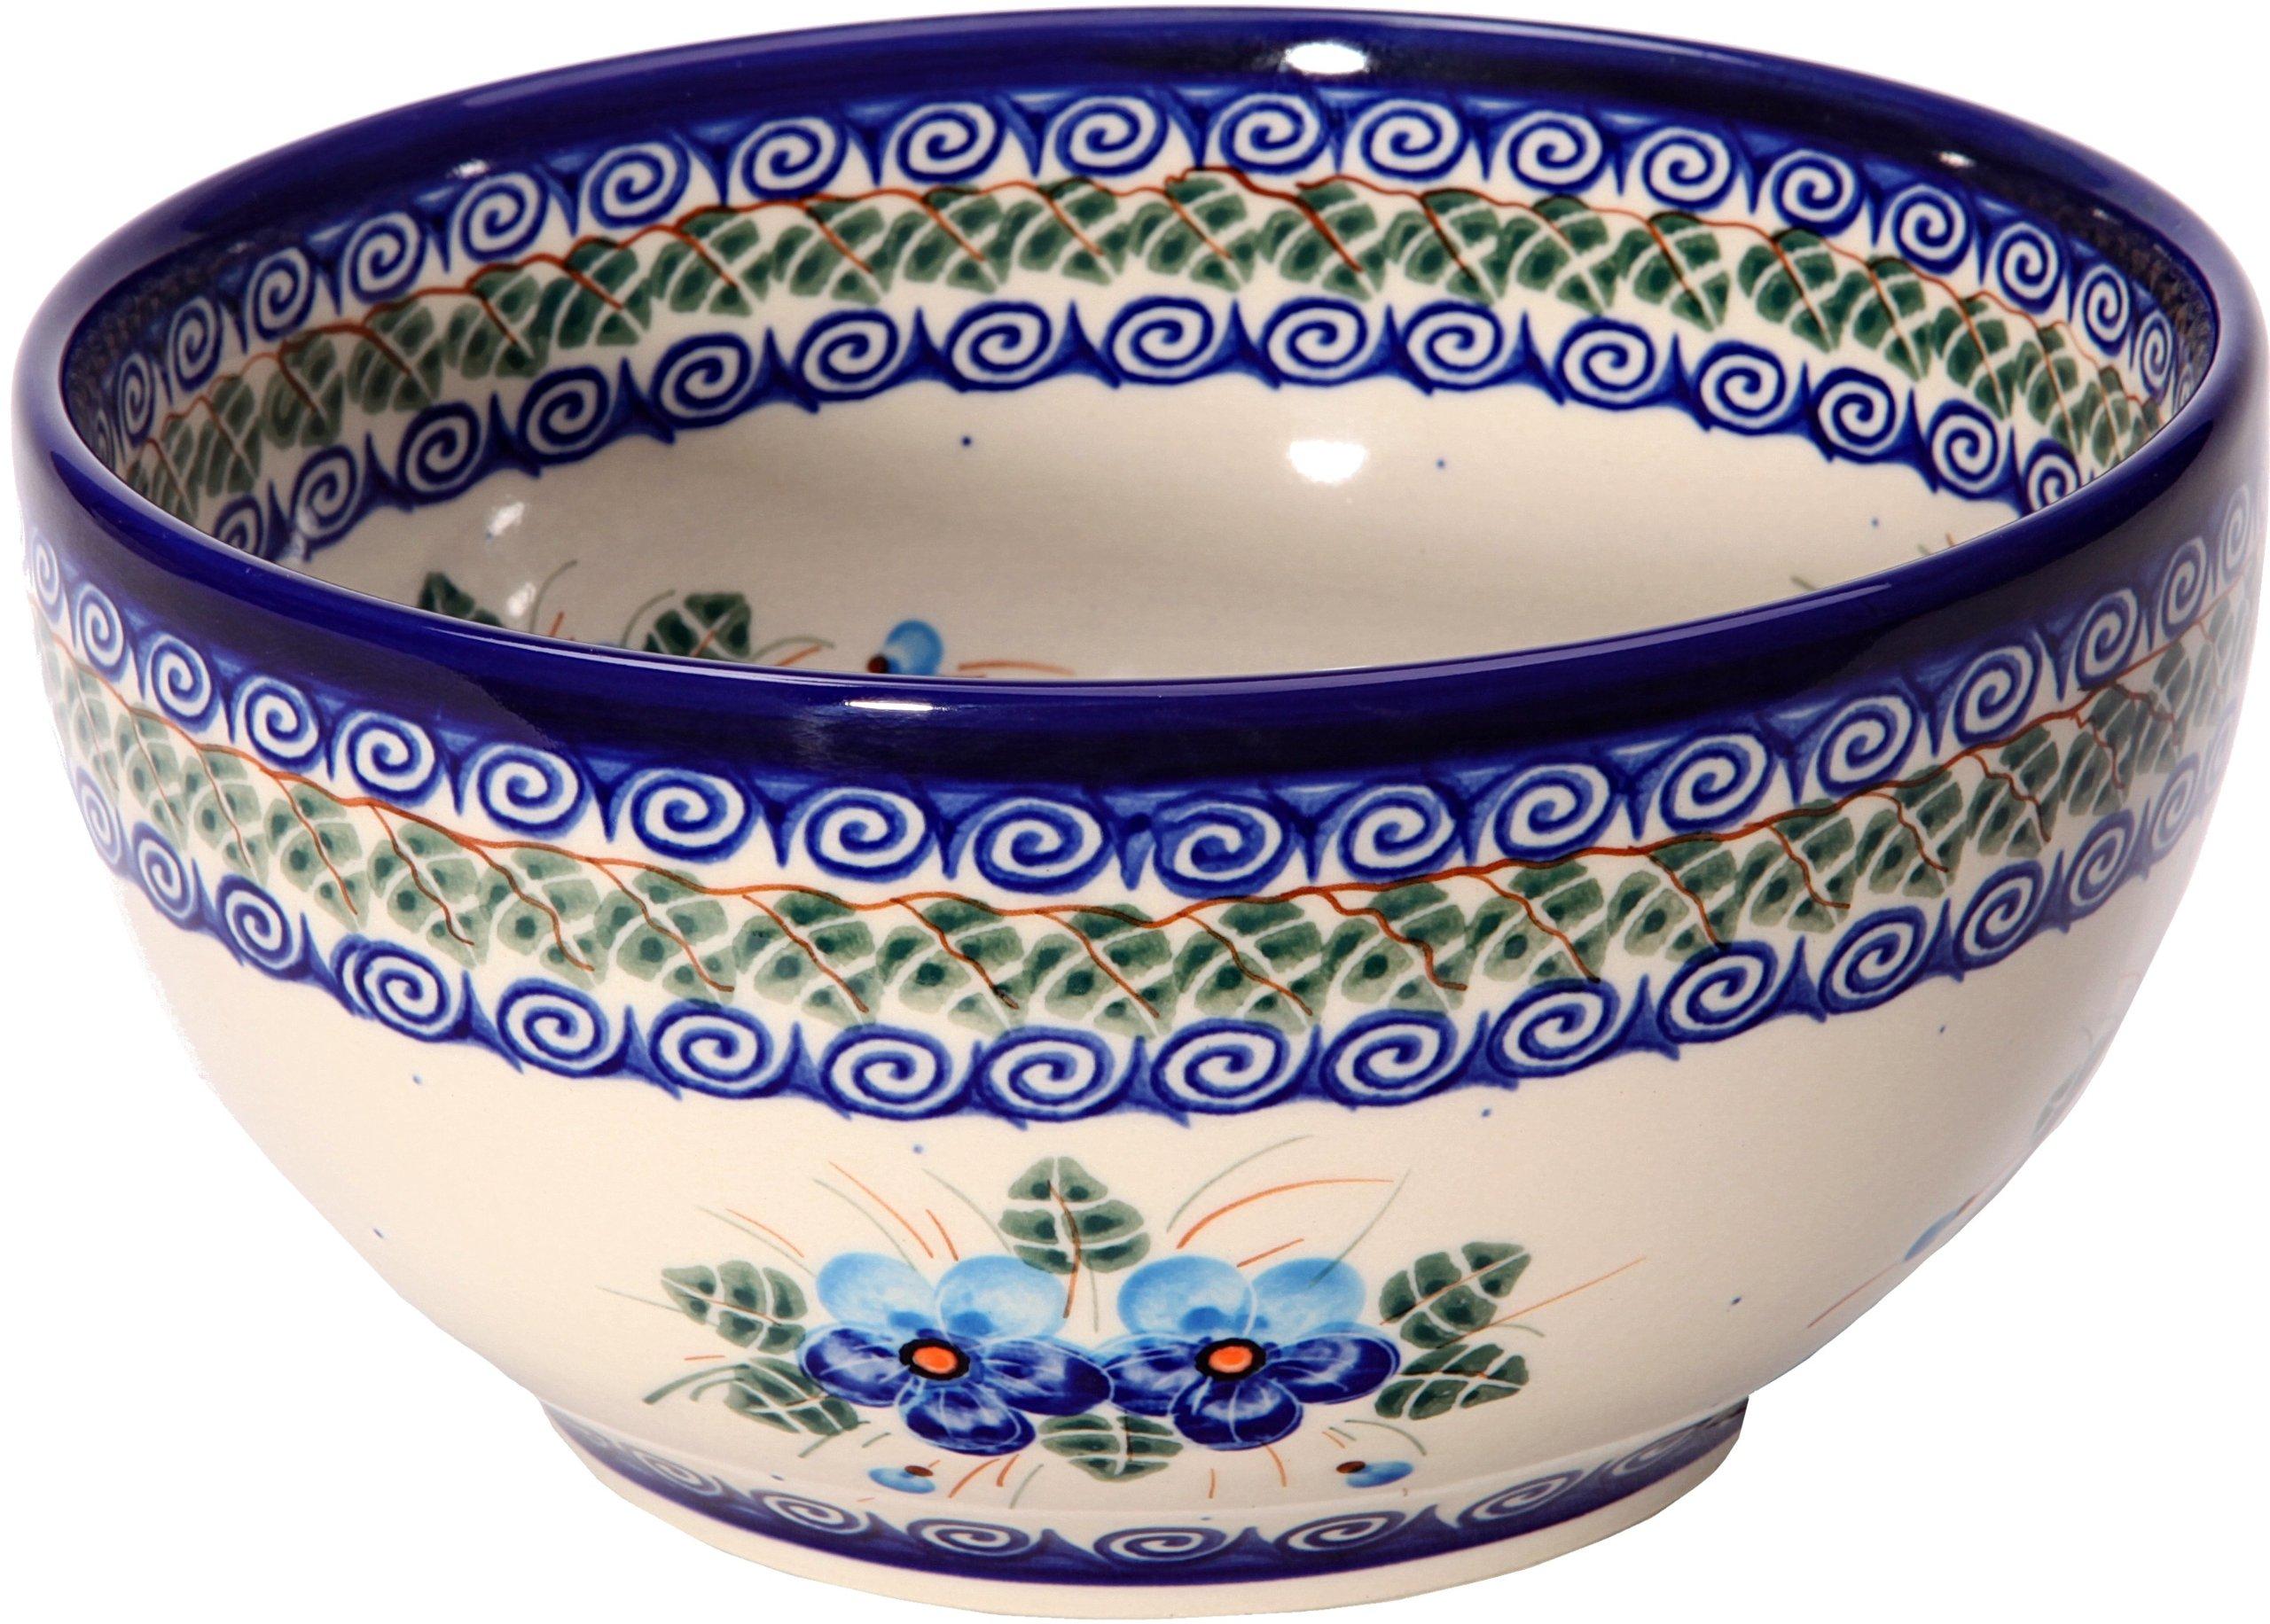 Polish Pottery Ceramika Boleslawiec, 0410/162, Bowl 19, 5 1/4 Cups, Royal Blue Patterns with Blue Pansy Flower Motif by Polish Pottery Ceramika Boleslawiec